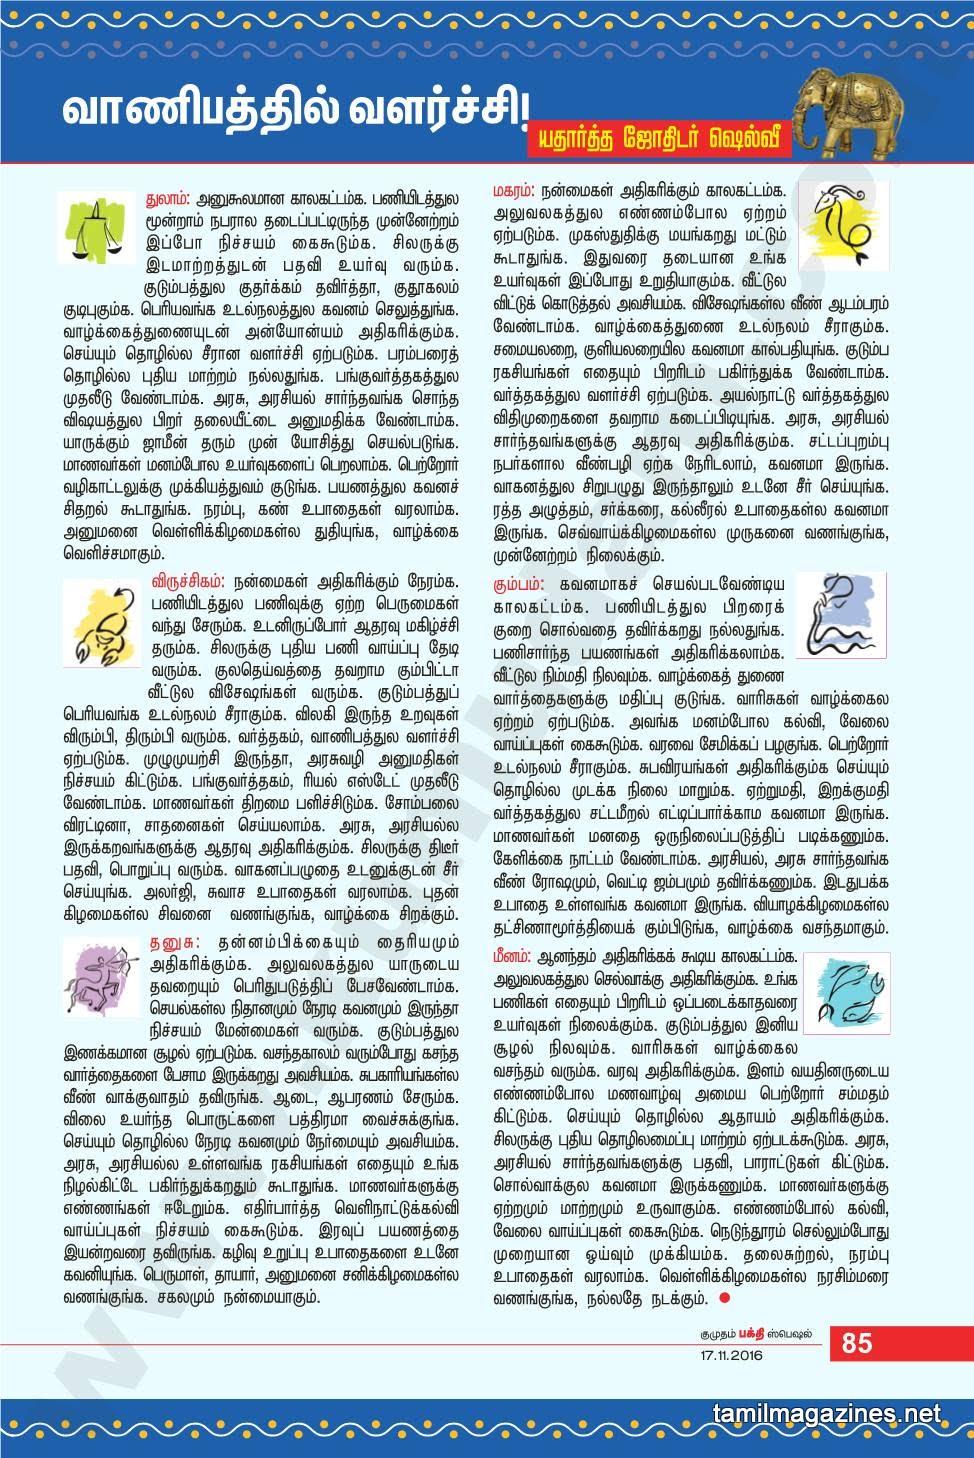 Rasipalan predictions by Jothidar Shelvi